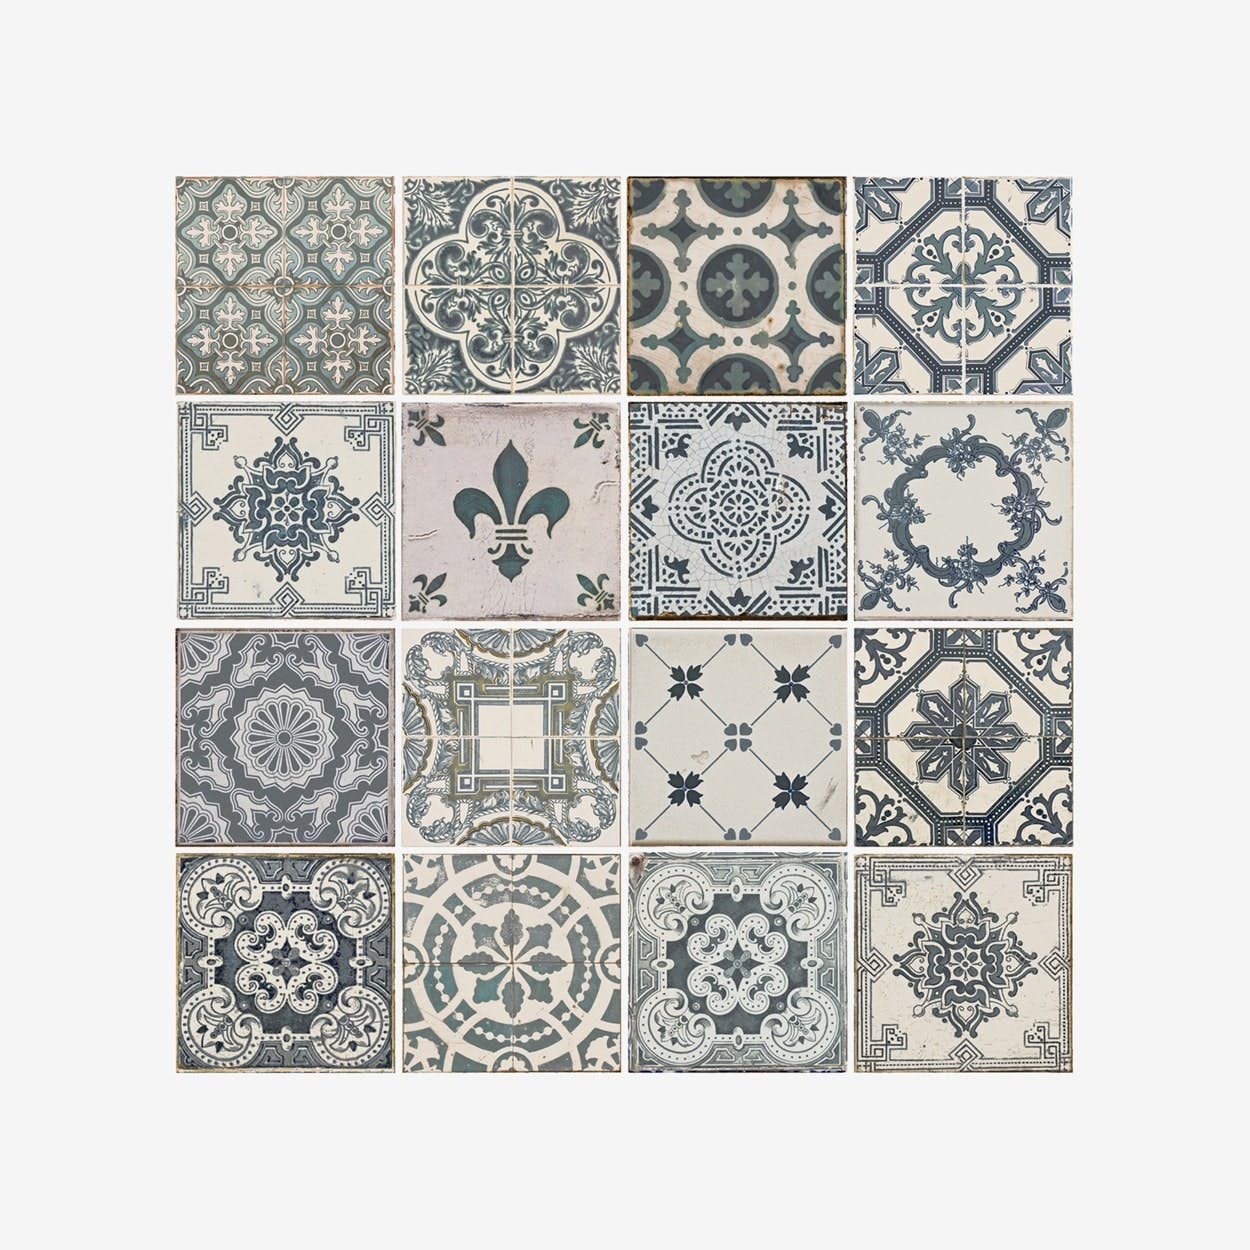 Vintage Blue Tile Pattern Self-adhesive Decal - Walplus